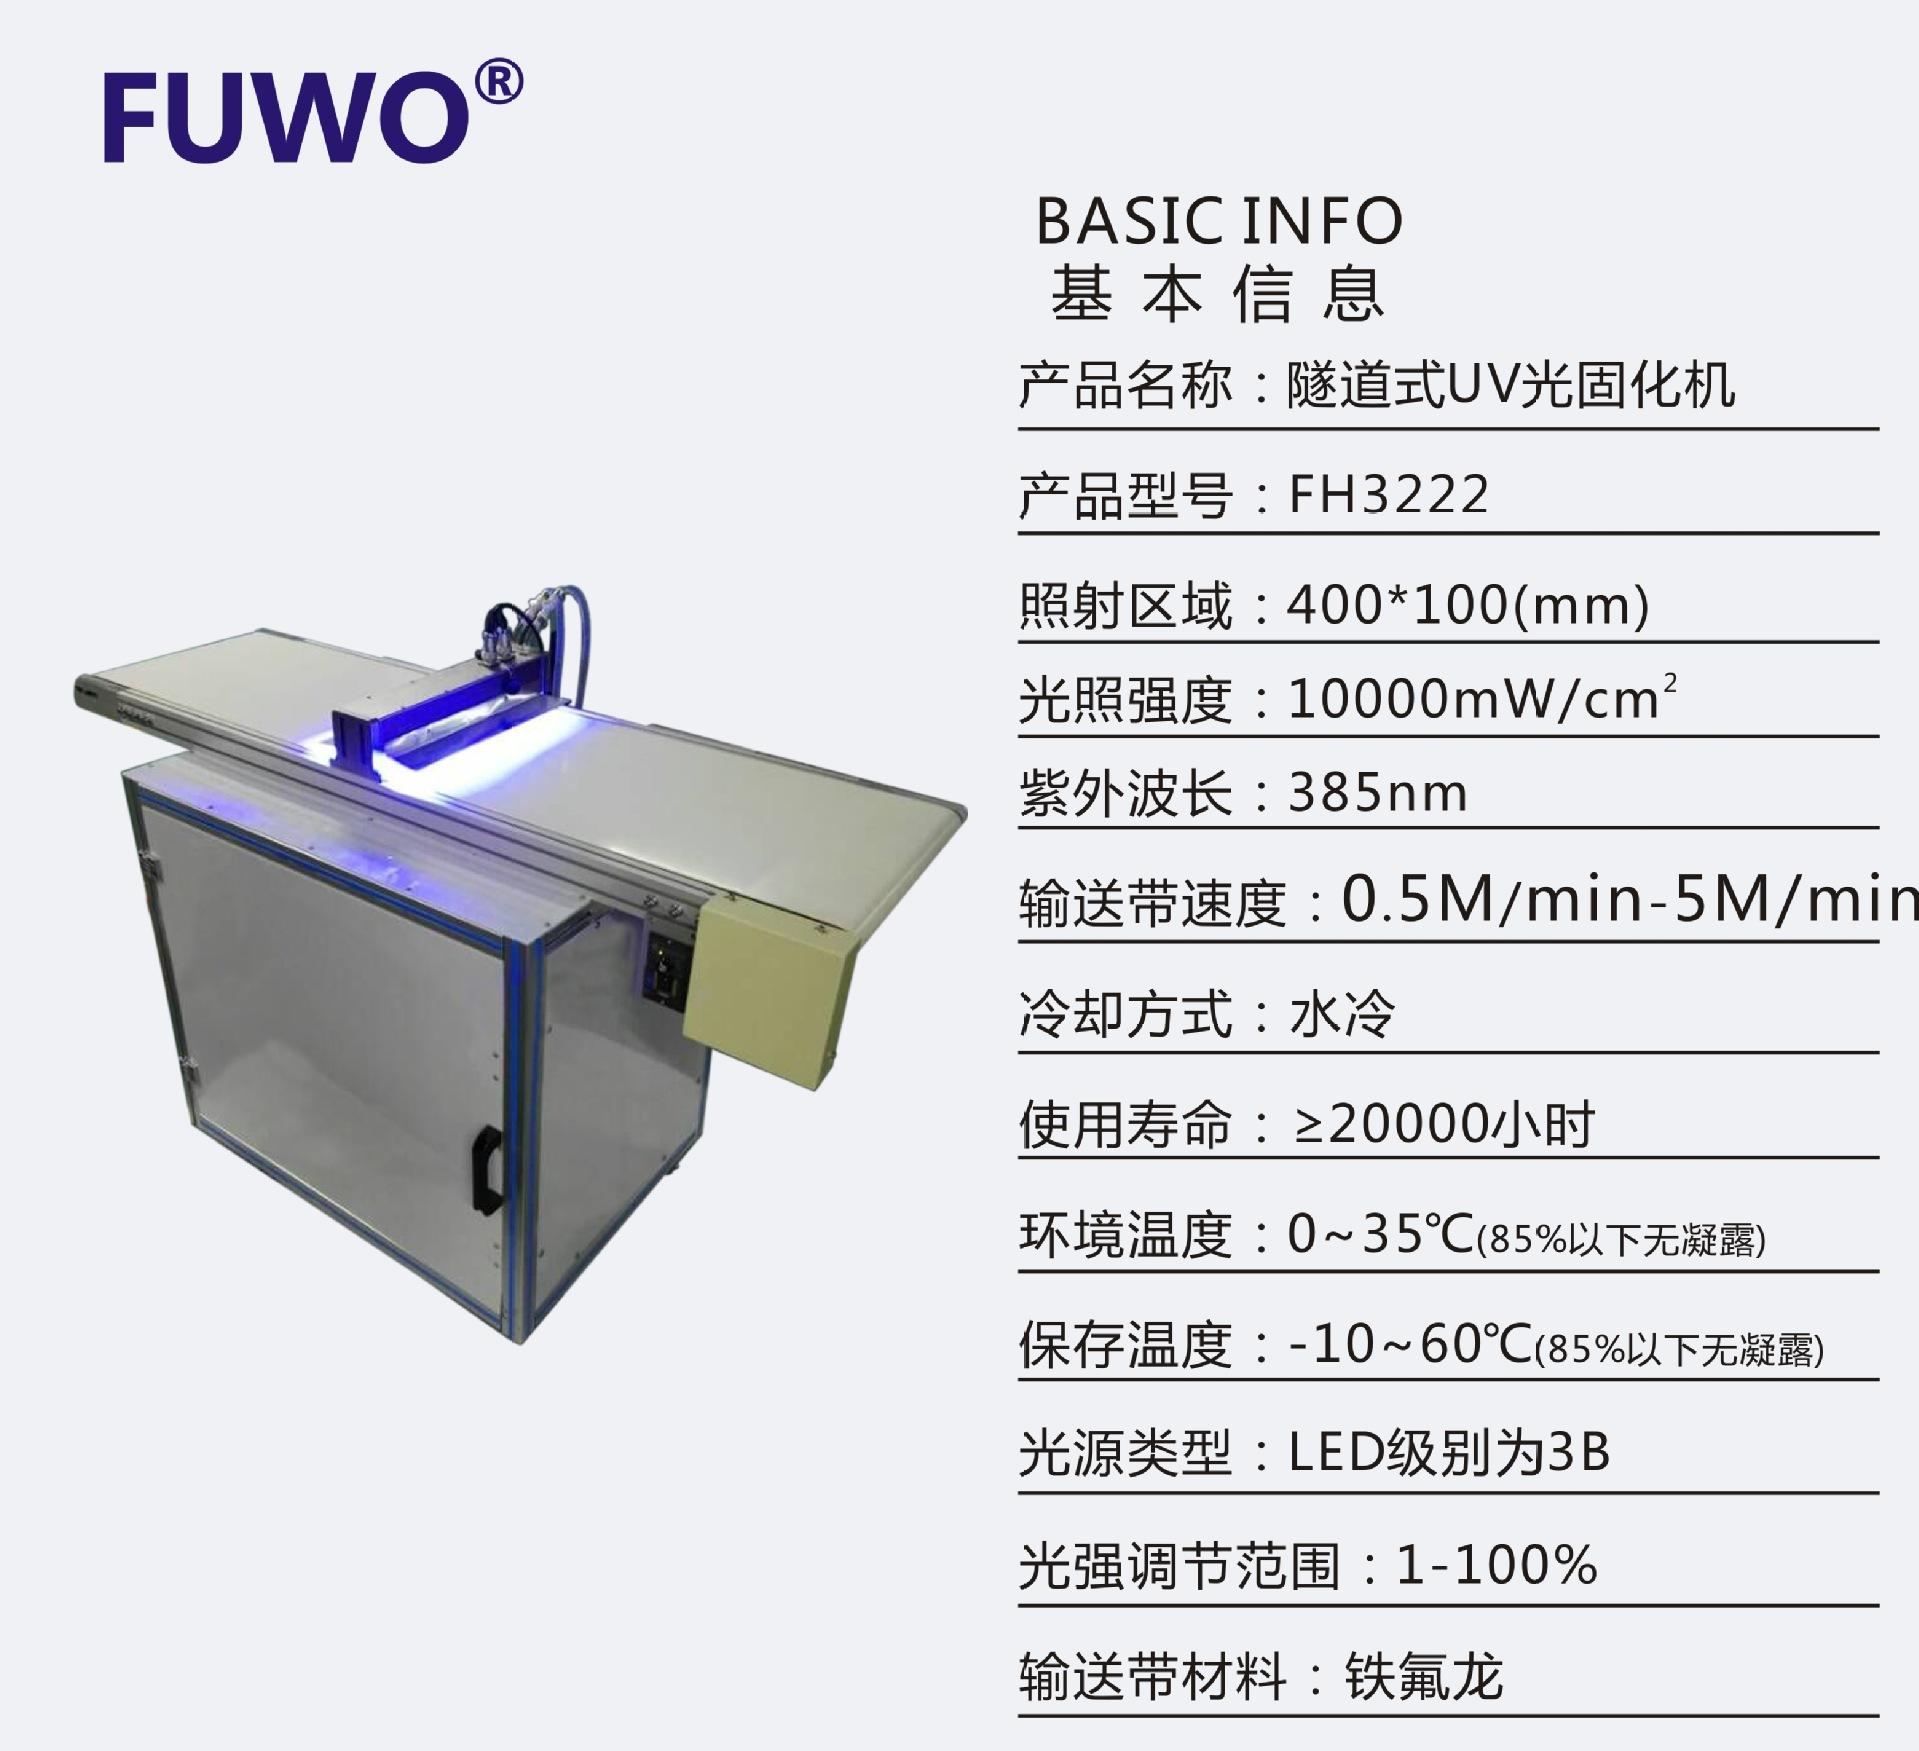 uv紫外线固化机_丝网uvled光固化光源,uv紫外线固化机